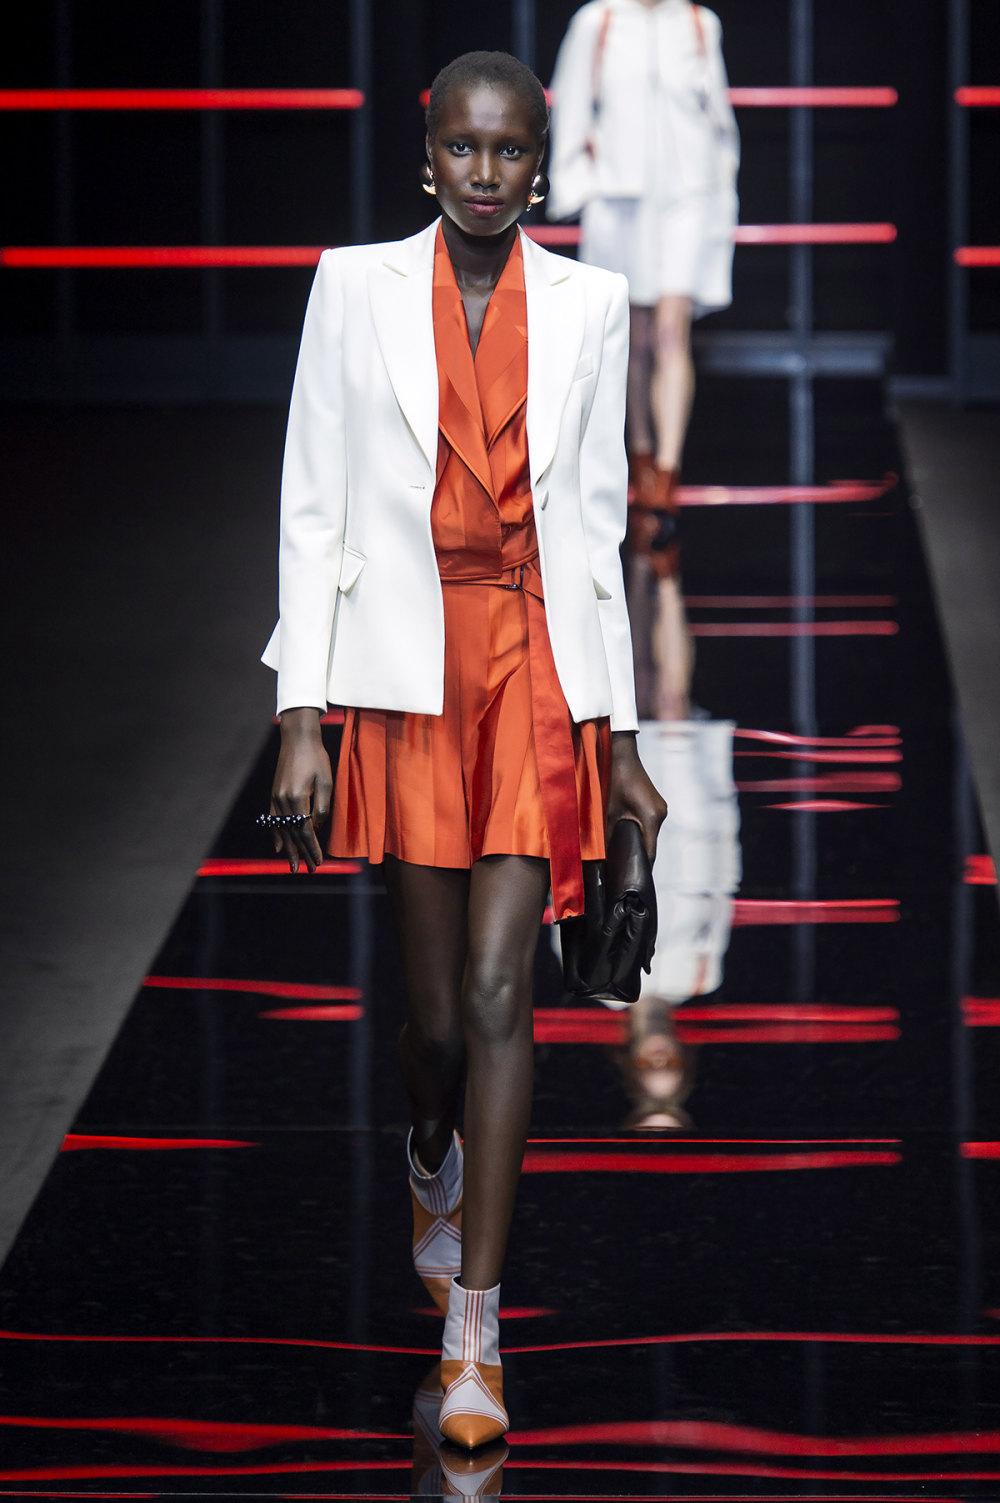 Emporio Armani时装系列畅的裤子带有柔滑裙子的鸡尾酒礼服-4.jpg